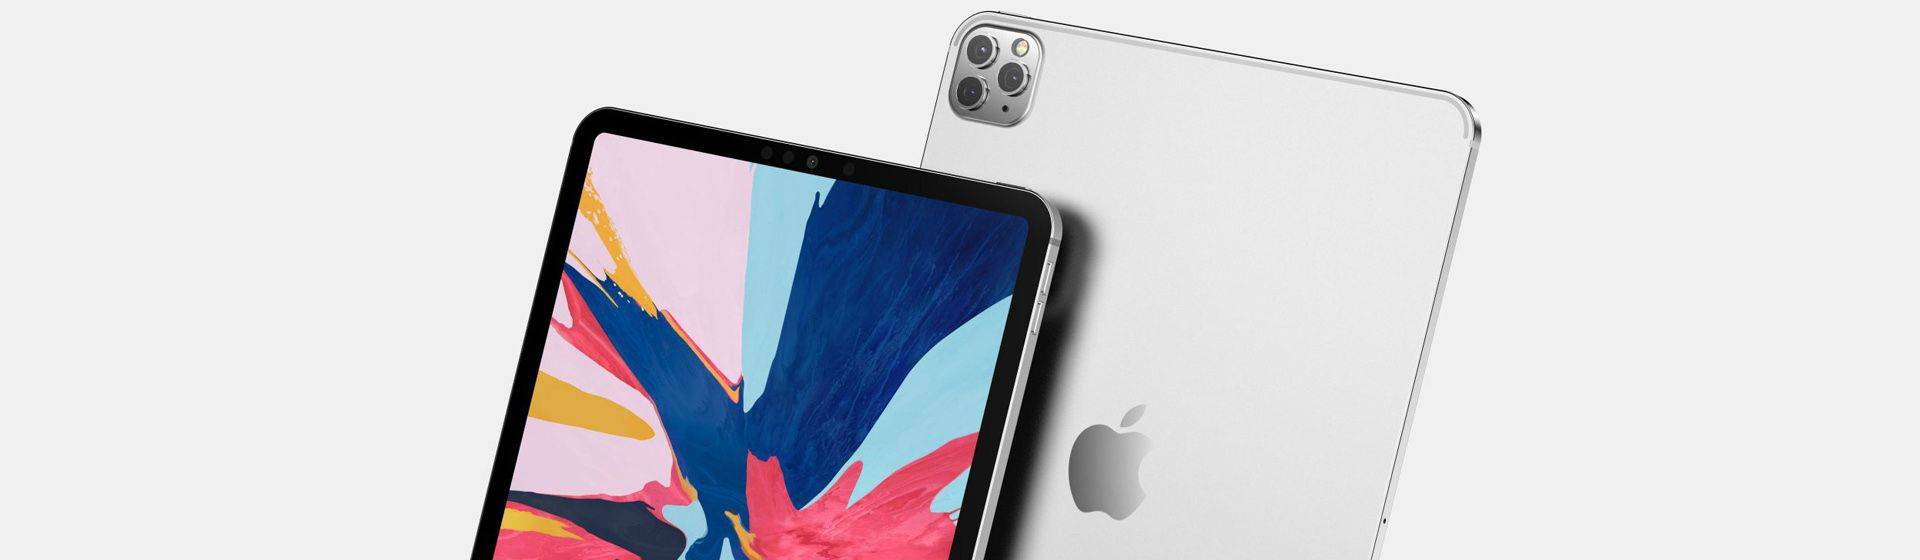 Ipad Pro com tela Mini-Led: tablet deve chegar no primeiro trimestre de 2021